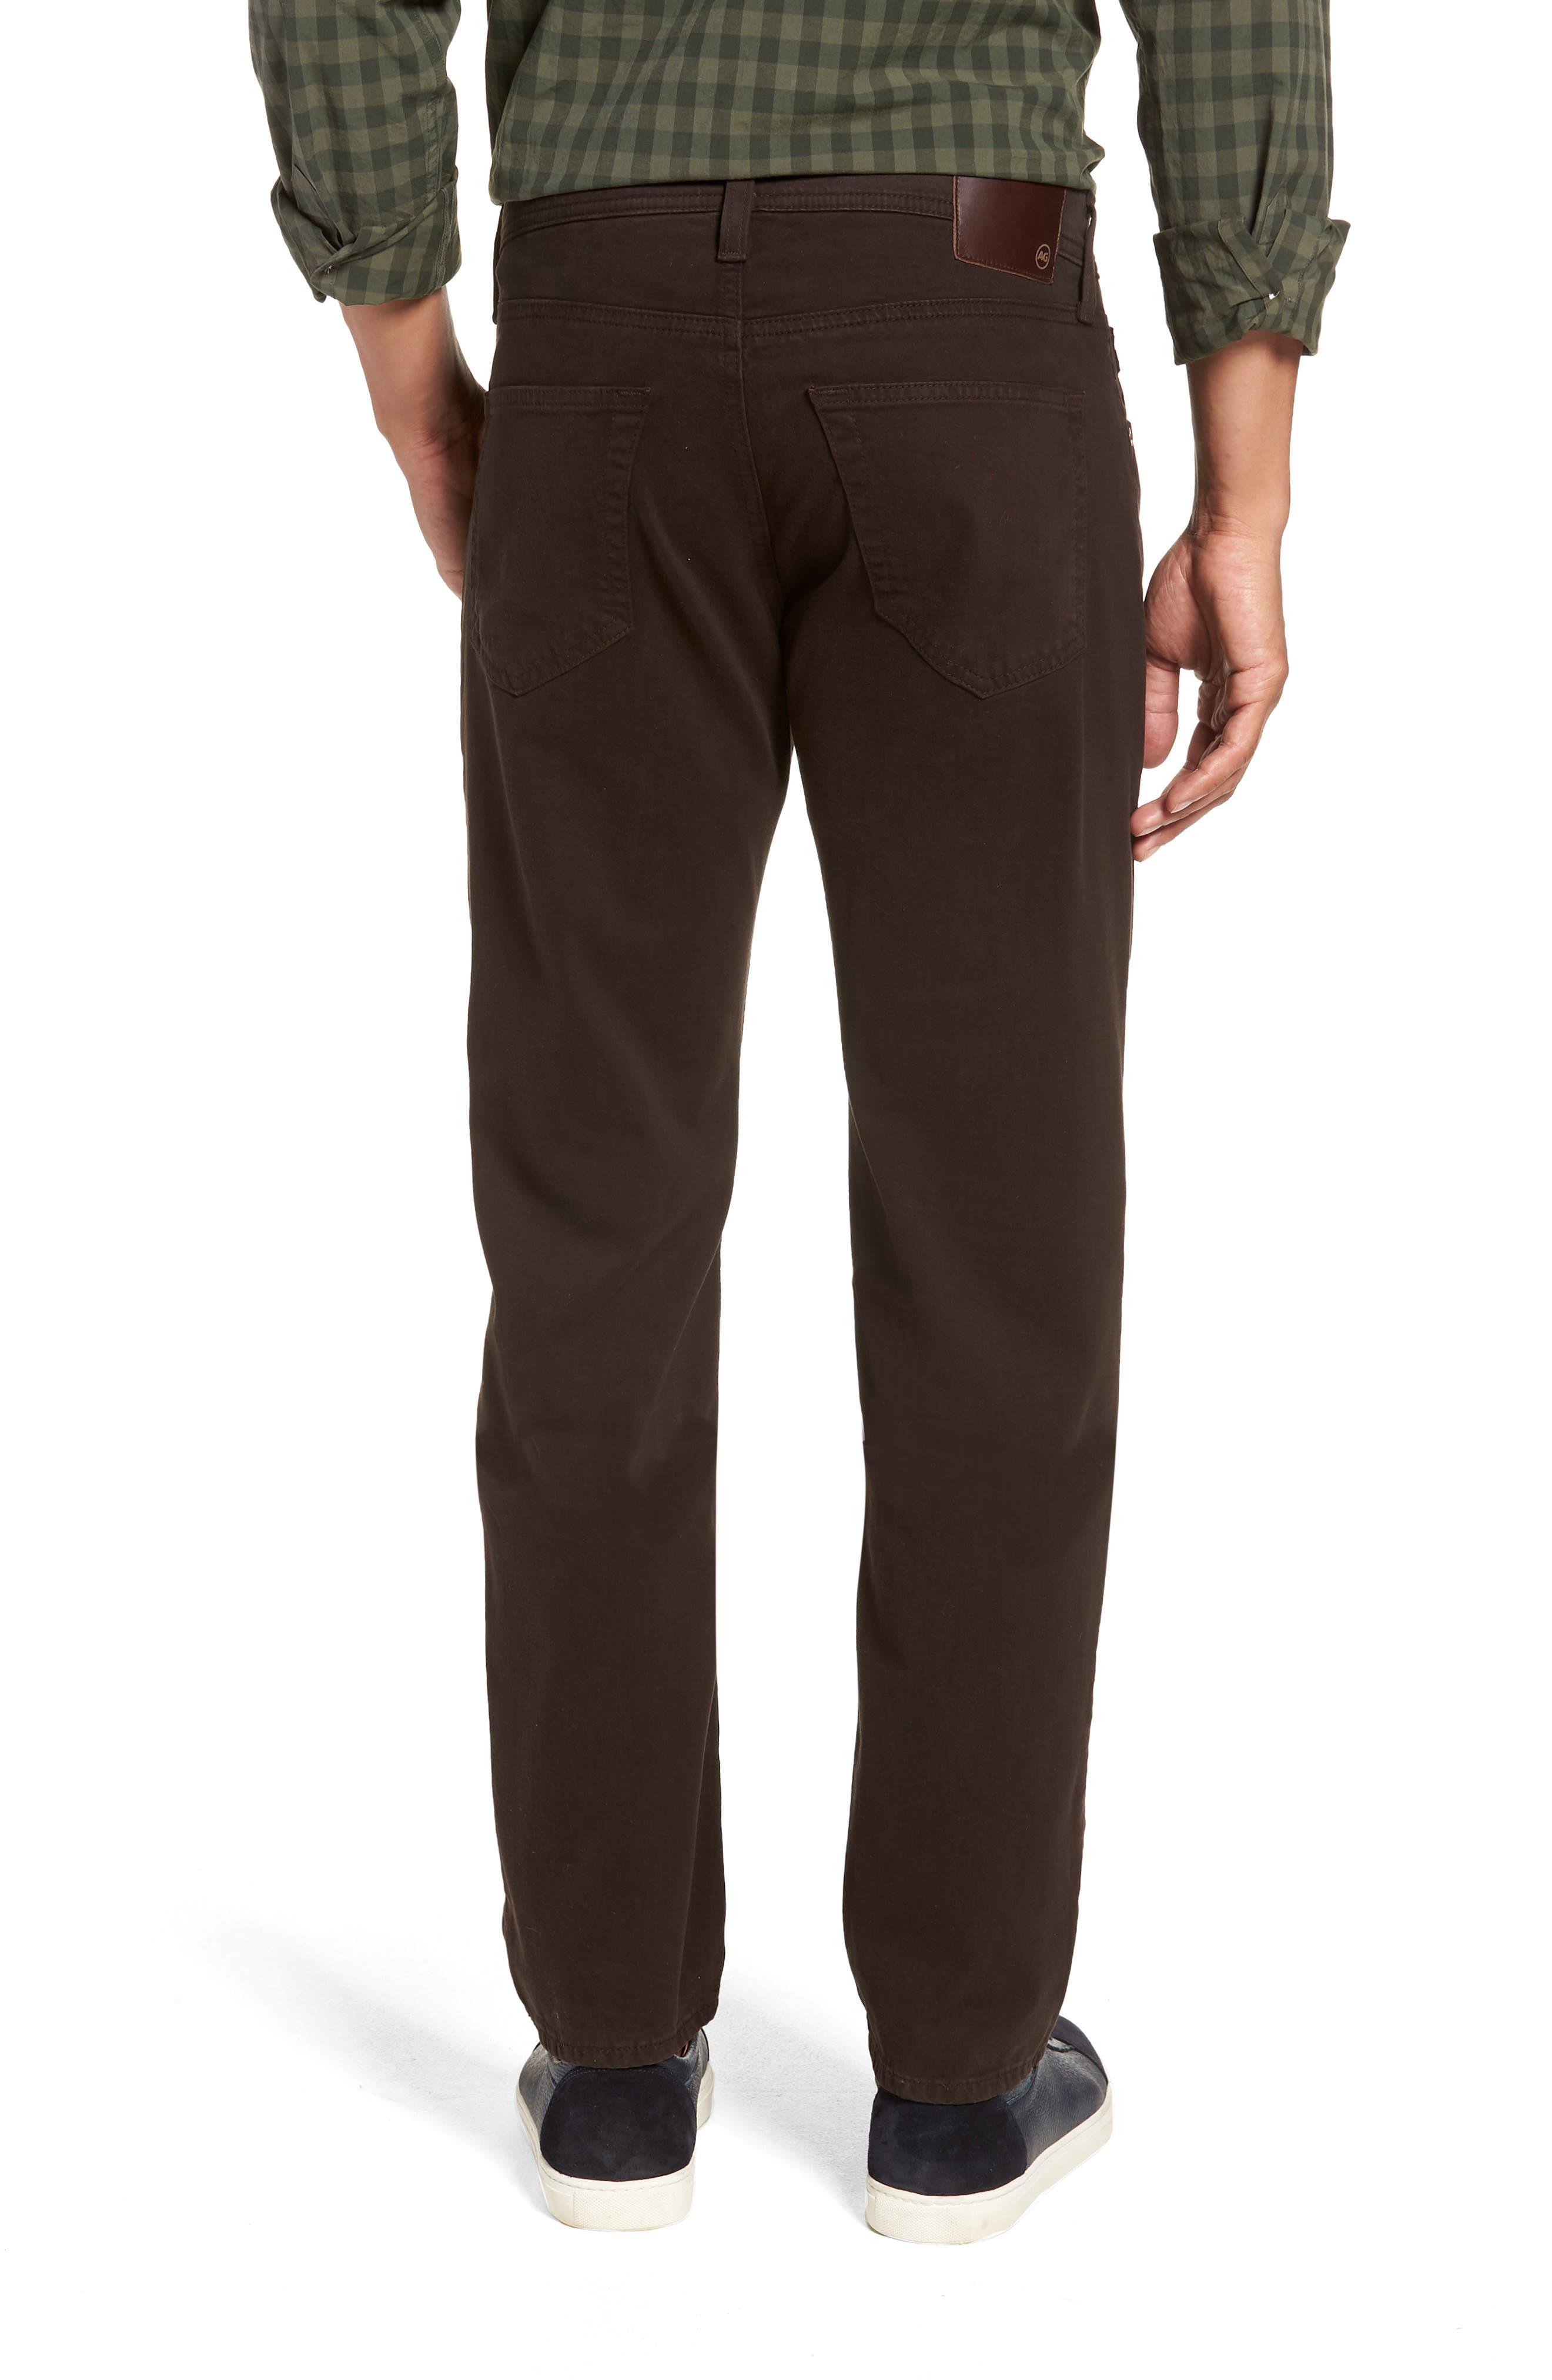 Tellis SUD Modern Slim Stretch Twill Pants,                             Alternate thumbnail 2, color,                             Shutter Brown